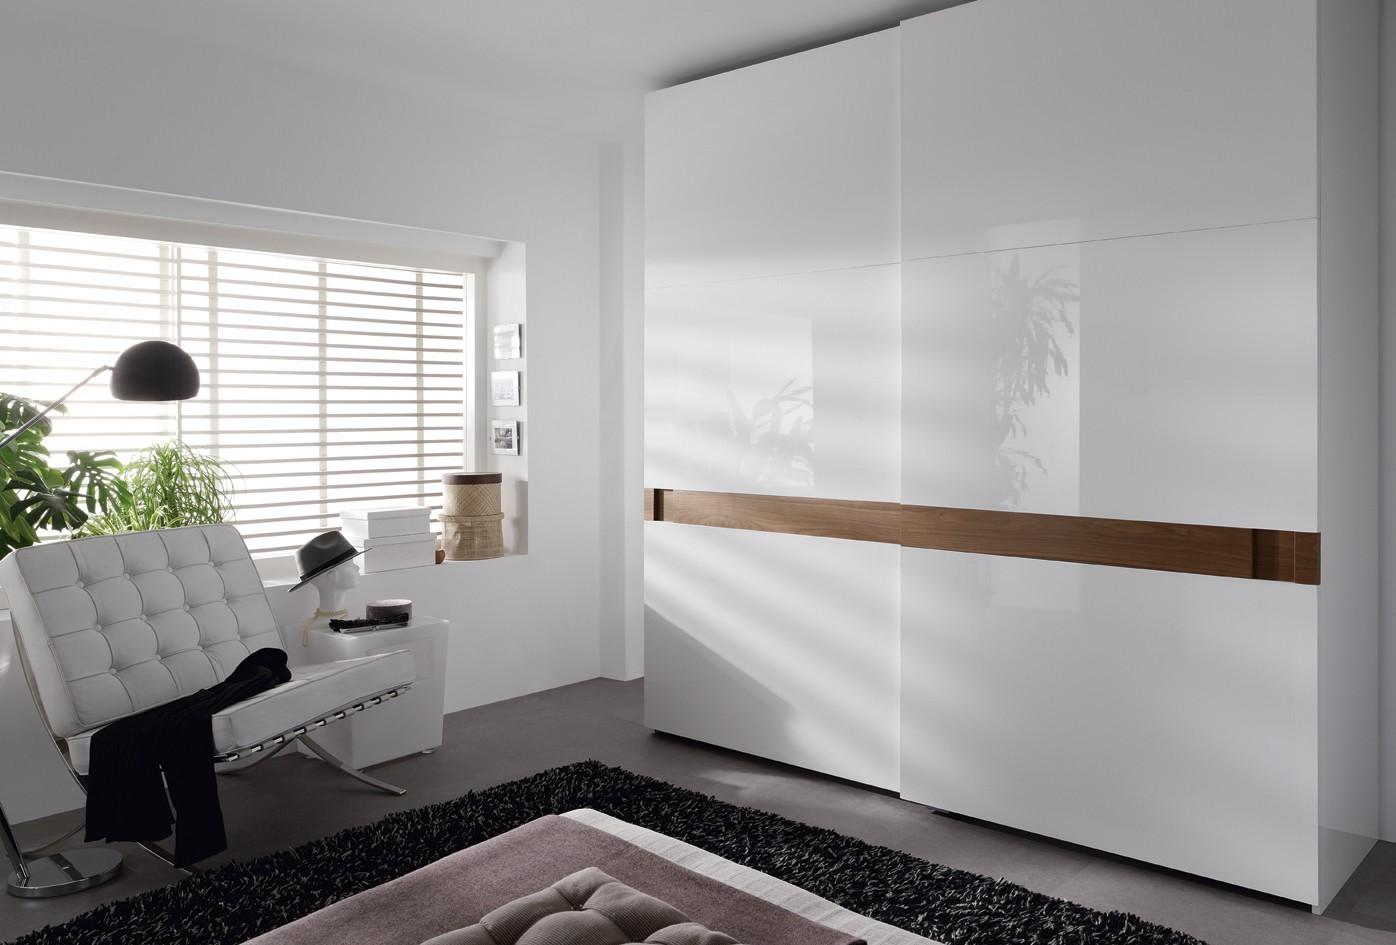 Imagenes armarios modernos nexo de piferrer built de for Armarios modernos